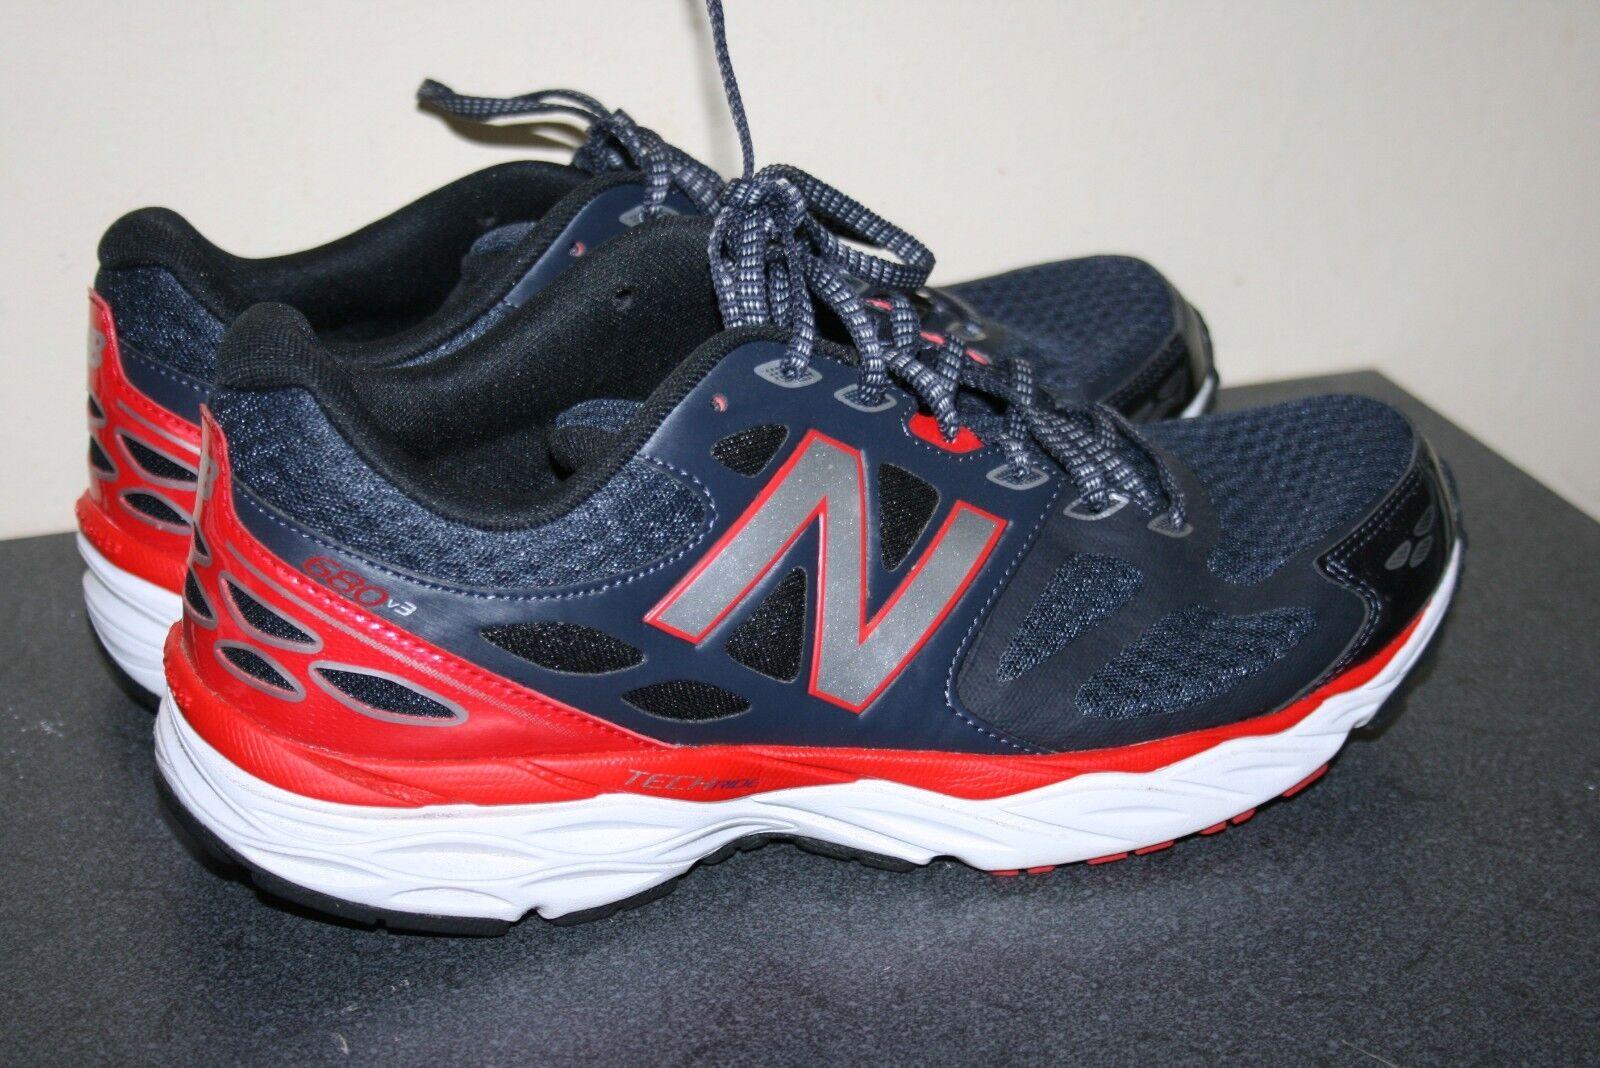 Mens Black & Red New Balance Tech Ride M680LB3 US Size 10.5 D Athletic shoes